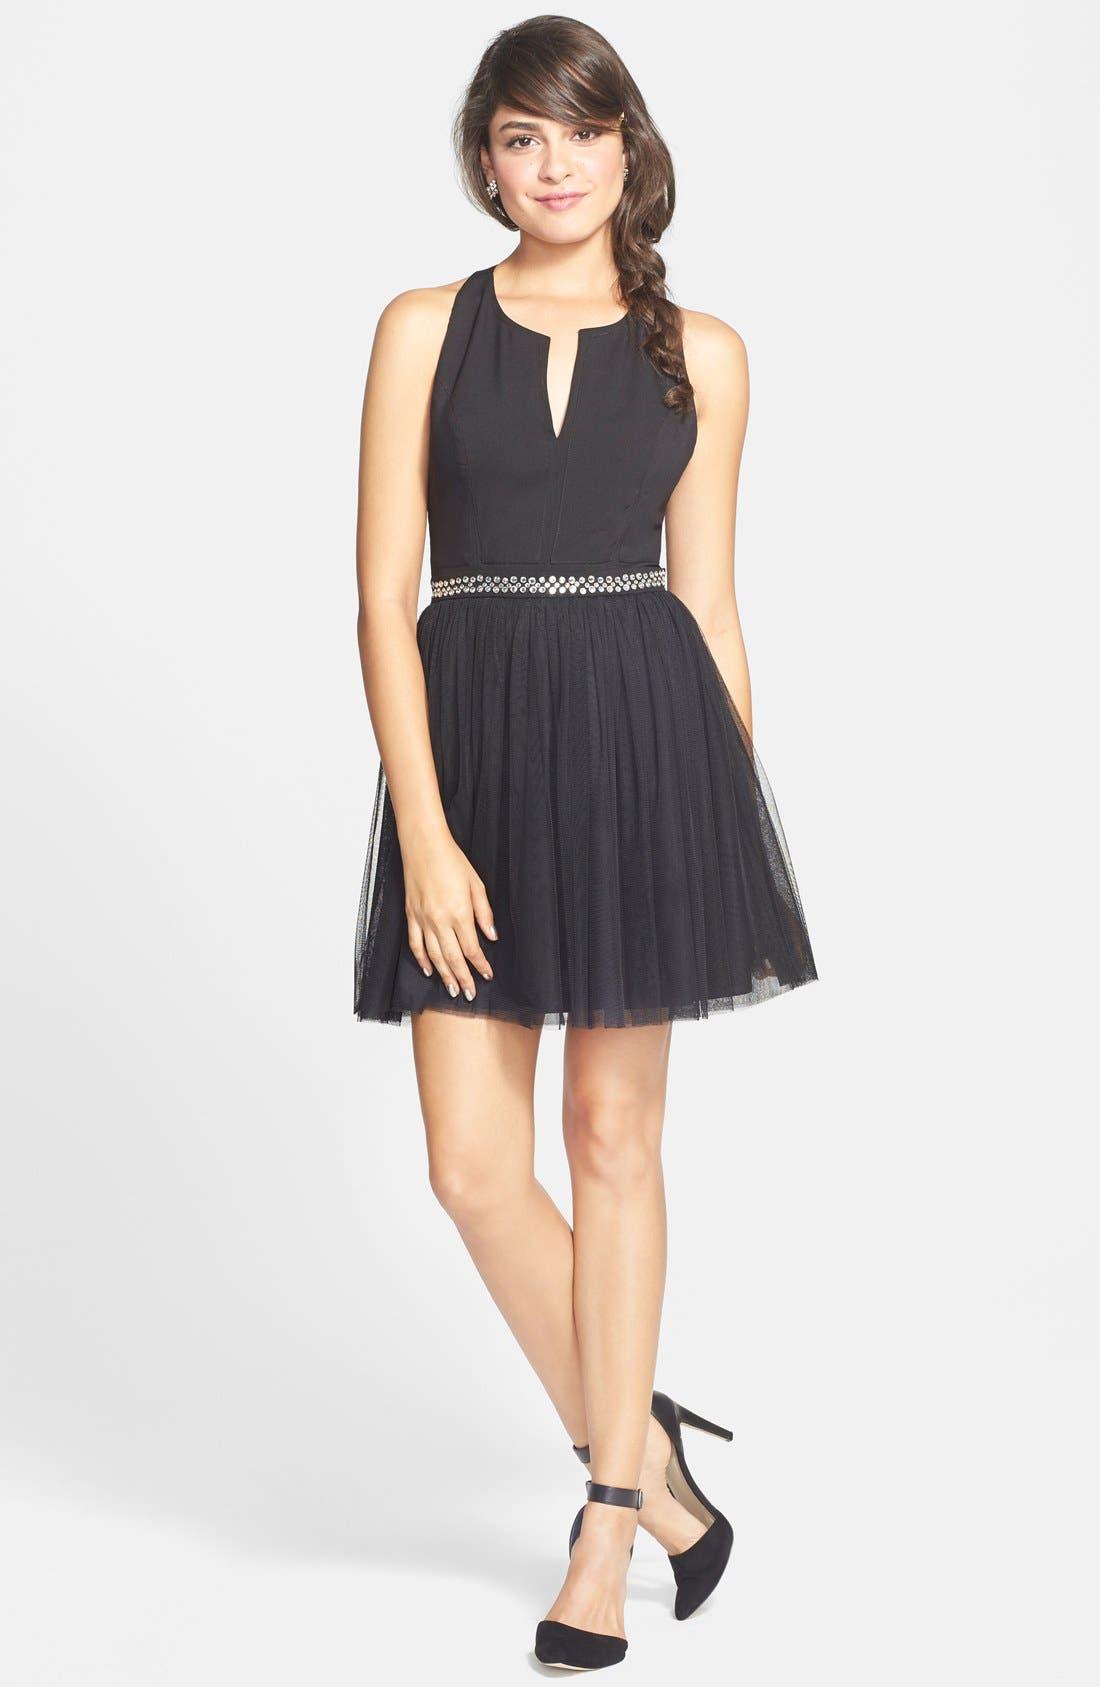 Alternate Image 1 Selected - En Crème Embellished Cutout Fit & Flare Dress (Juniors)